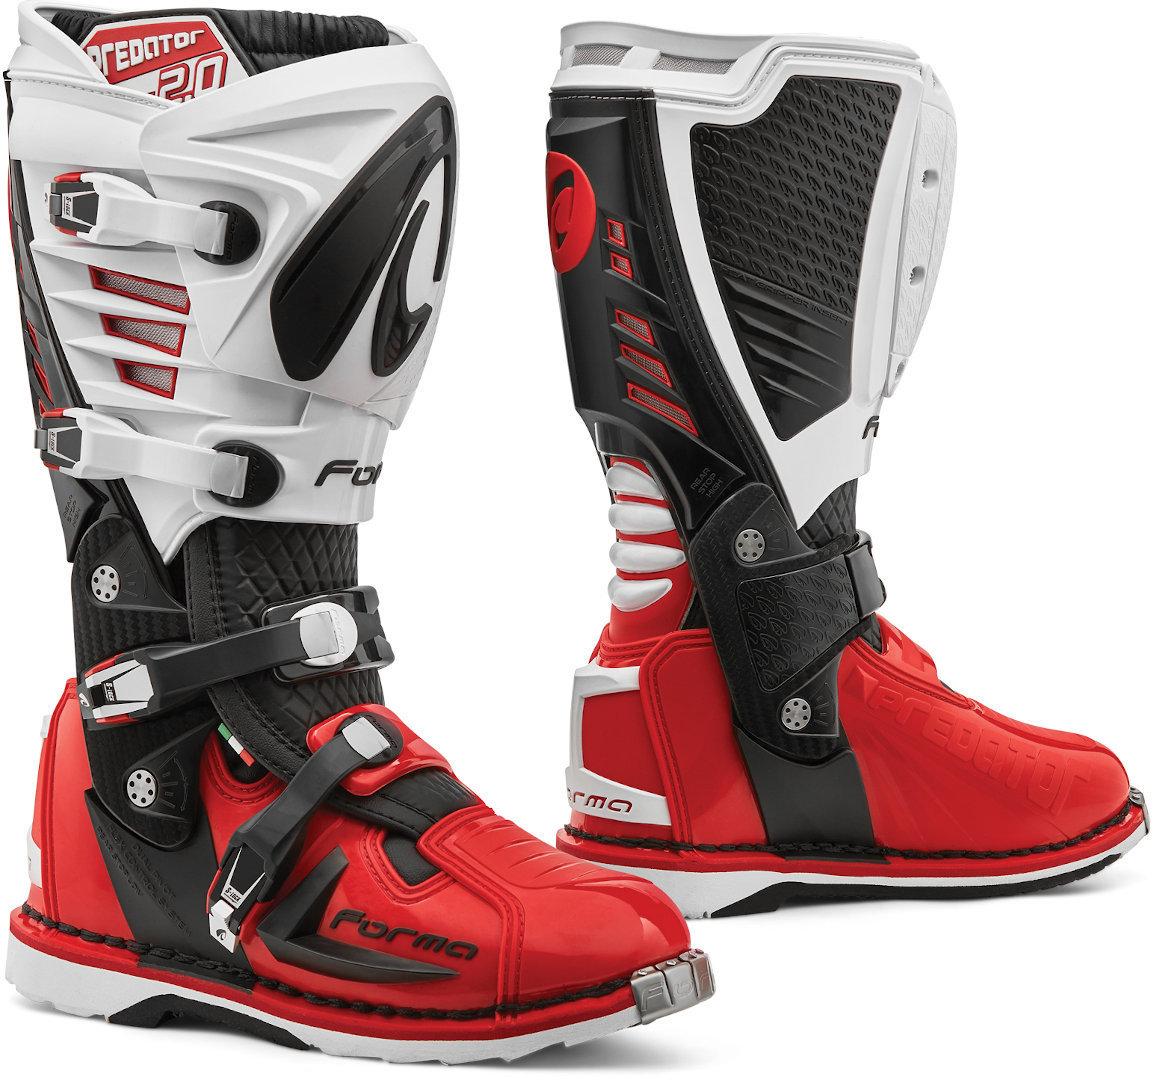 Forma Predator 2.0 Motocross Stiefel, schwarz-weiss-rot, Größe 42, schwarz-weiss-rot, Größe 42